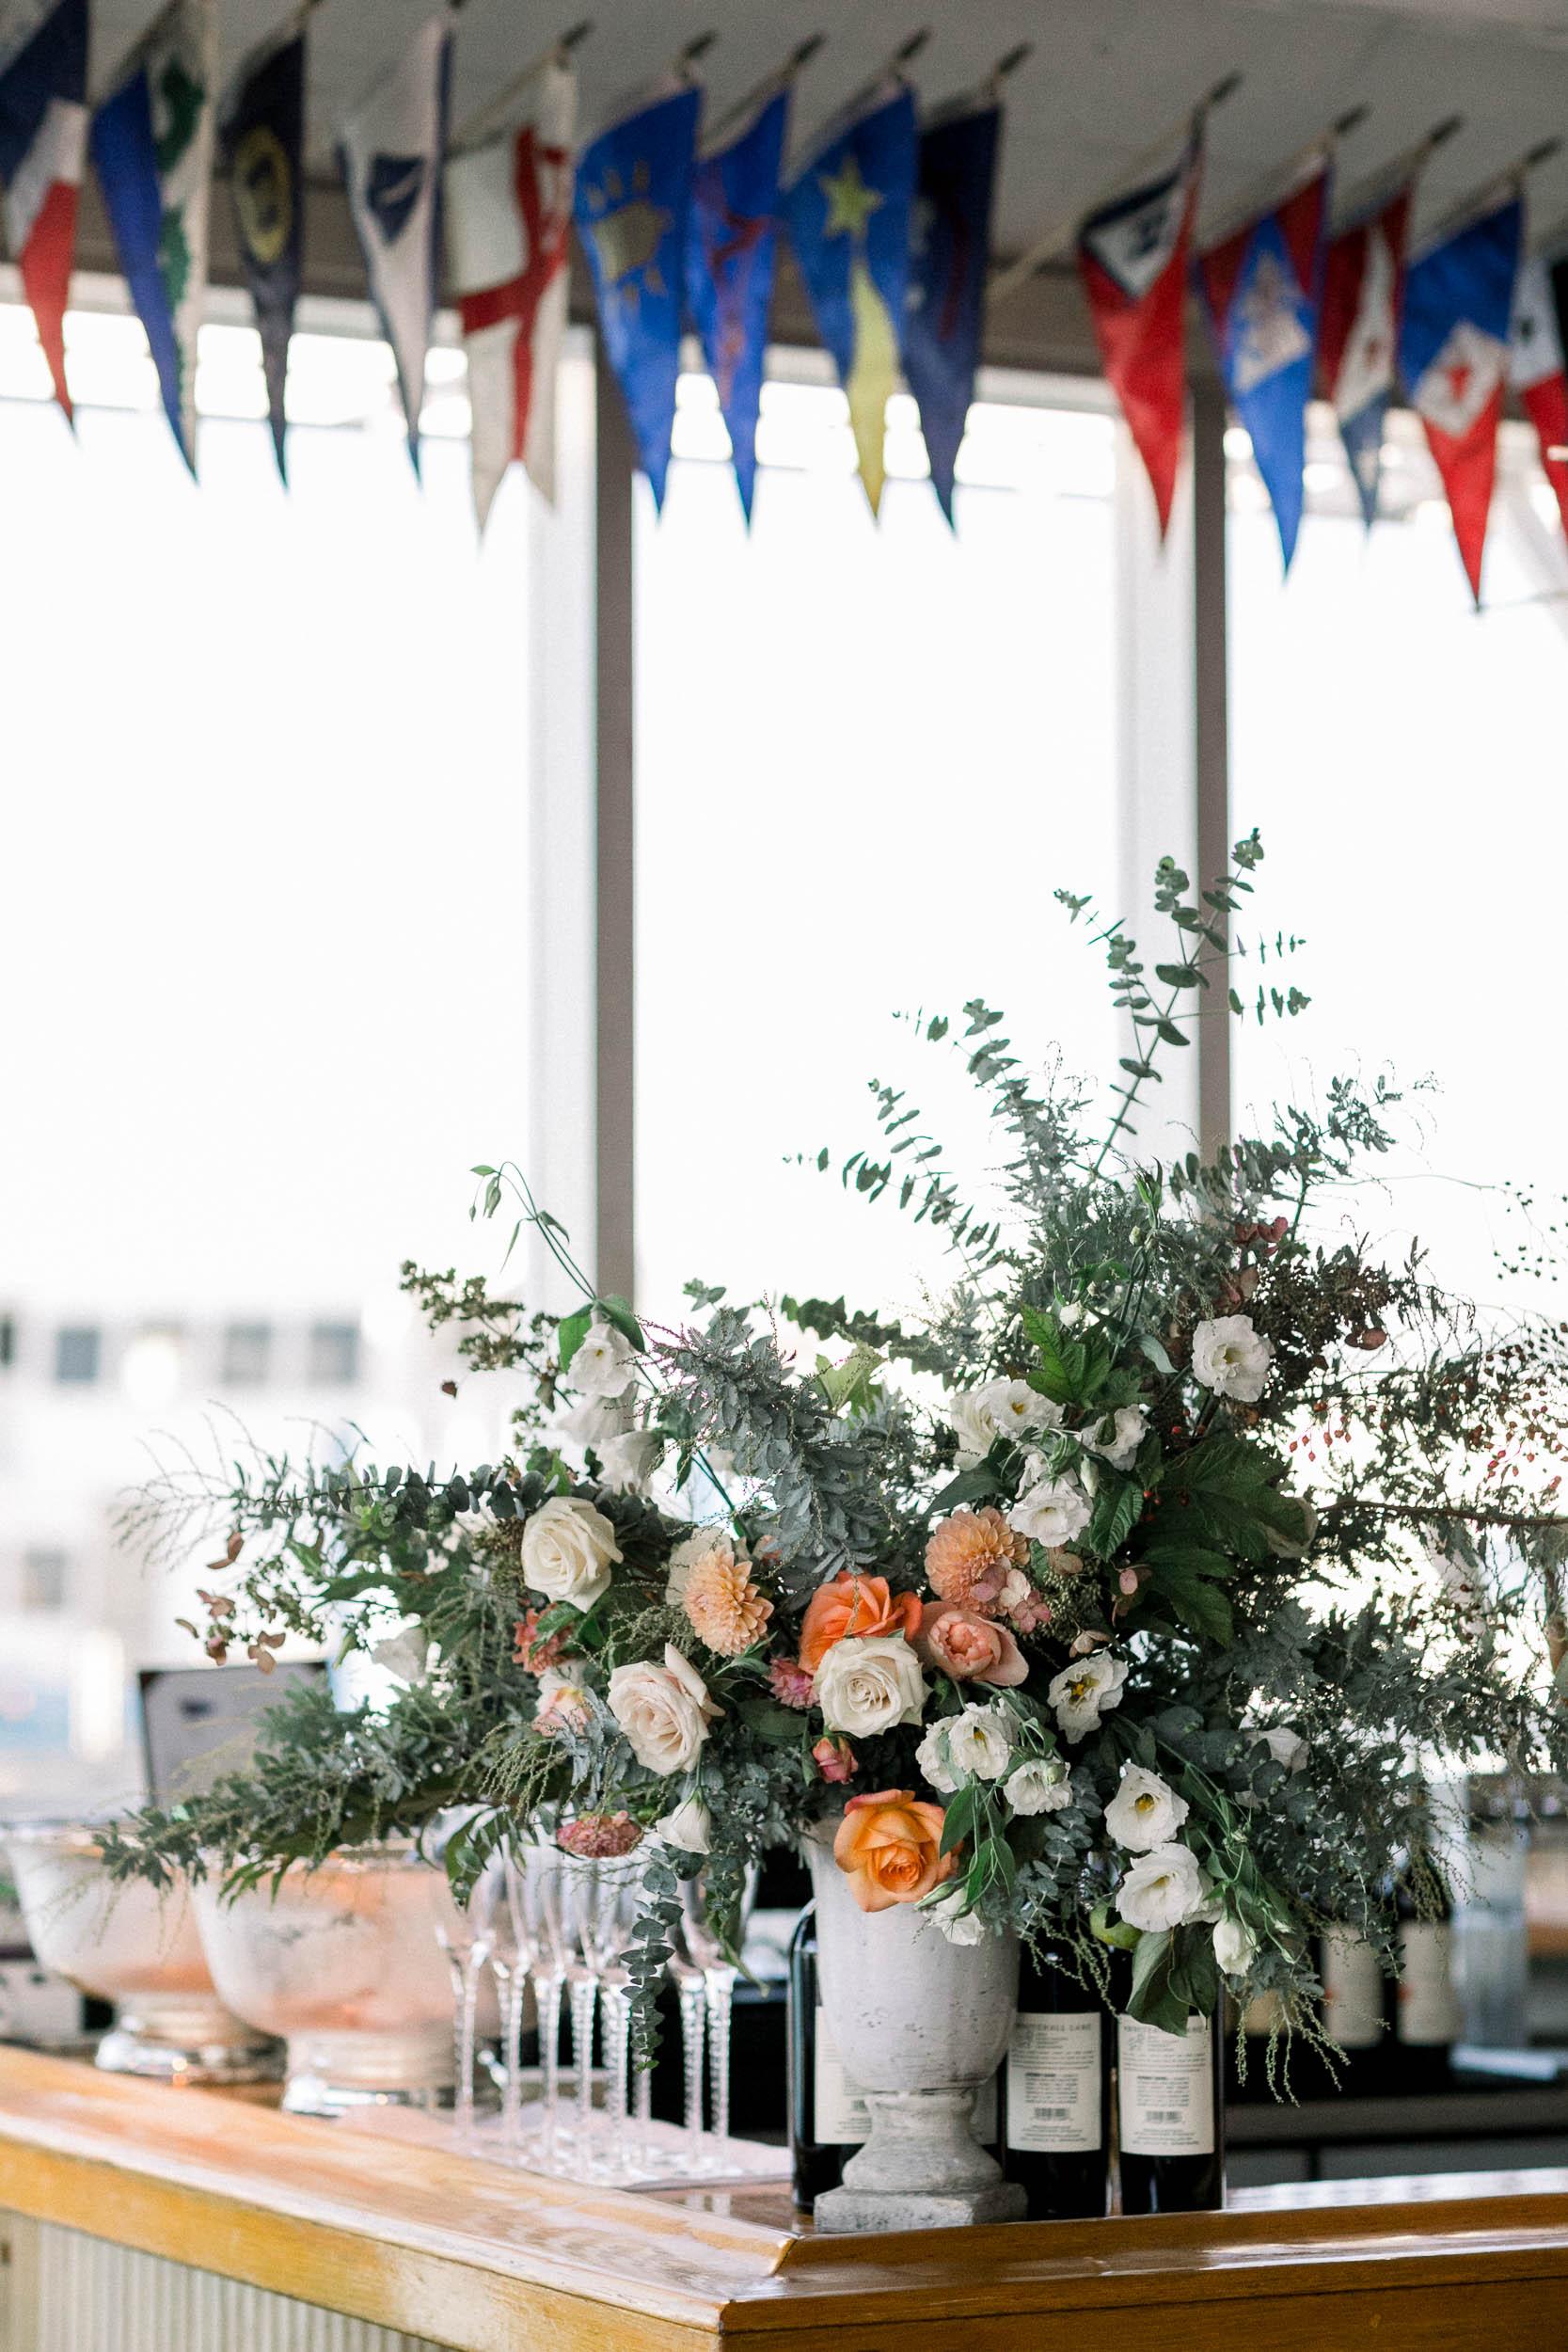 092218ER608_Sausalito Yacht Club Wedding_Buena Lane Photography.jpg